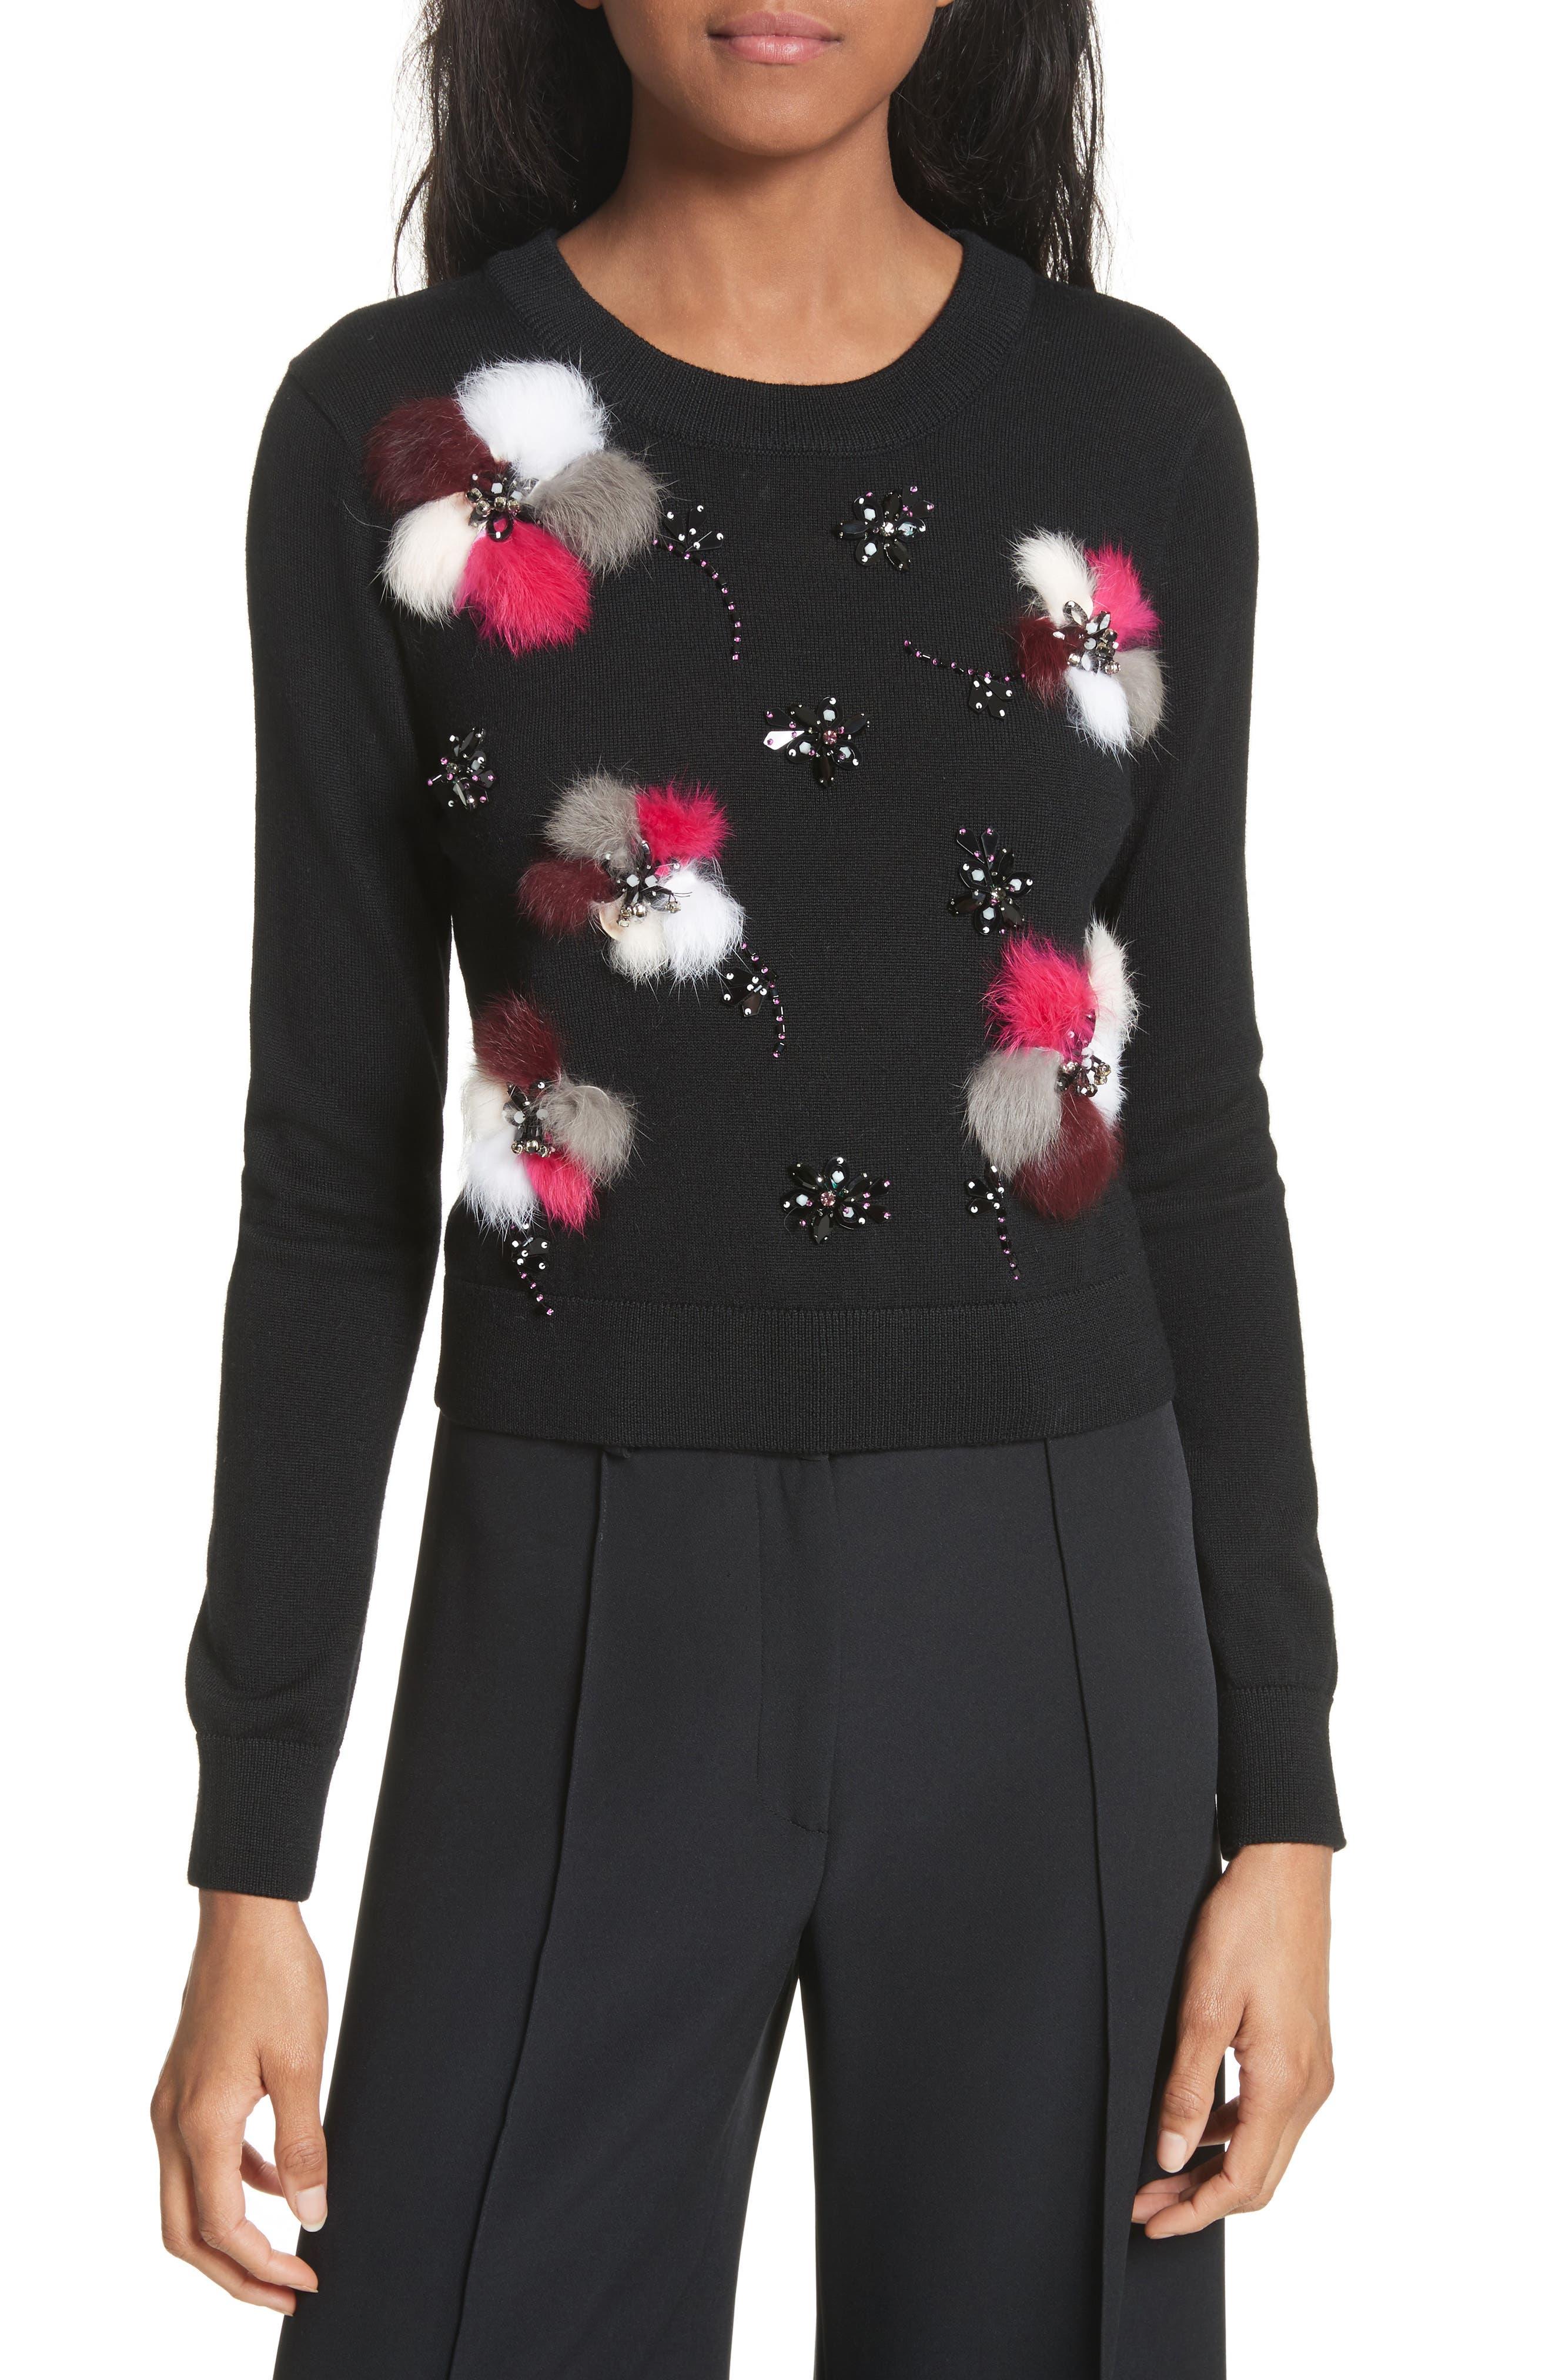 Beaded Wool Sweater with Genuine Rabbit Fur Trim,                             Main thumbnail 1, color,                             Black